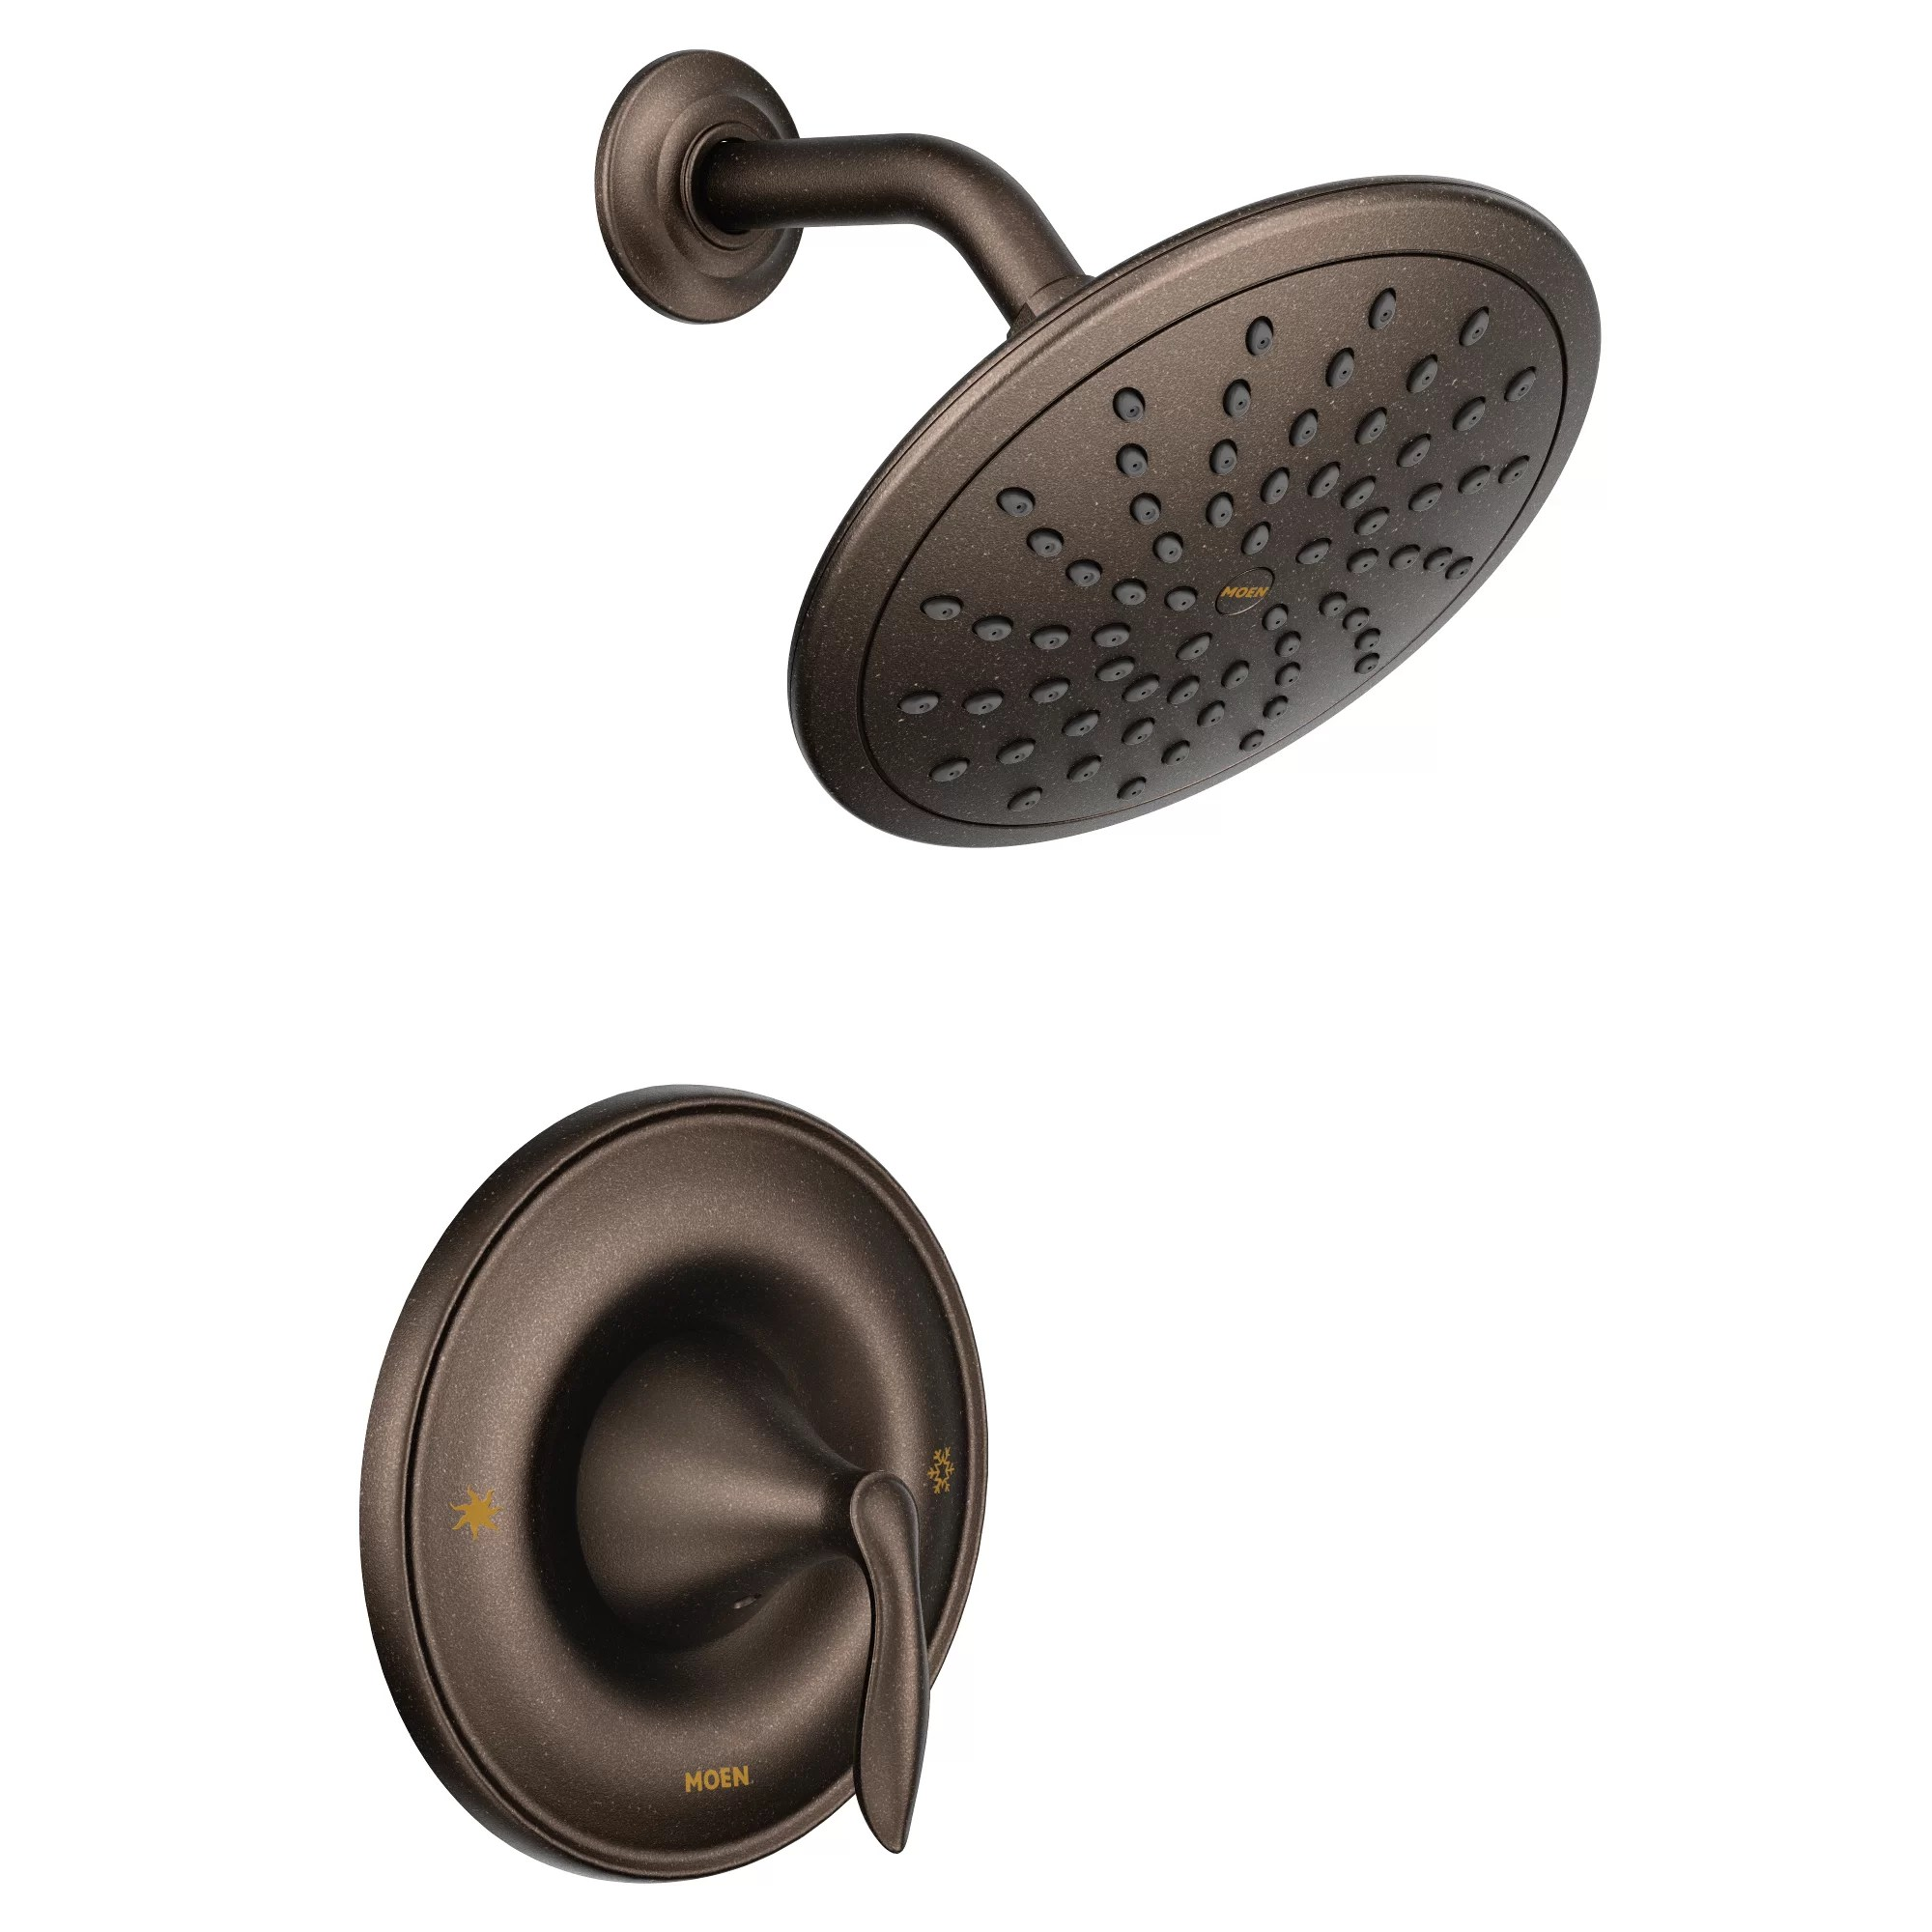 Eva Diverter Shower Faucet With Lever Handle